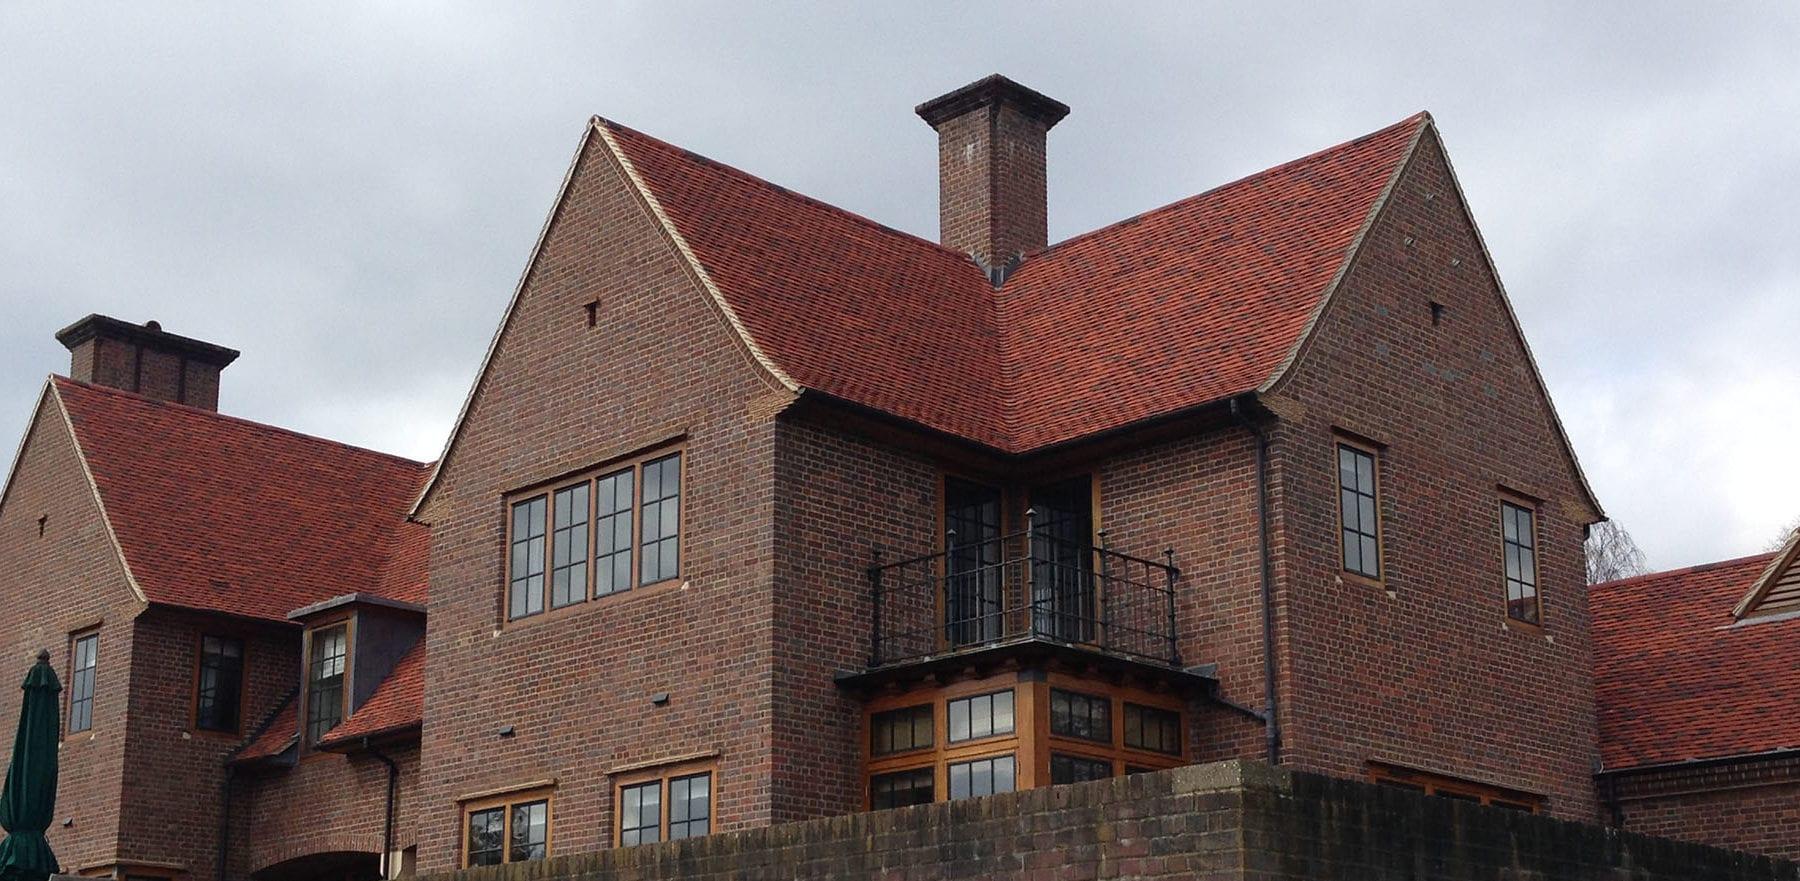 Lifestiles - Handmade Bespoke Clay Roof Tiles - Chipstead, England 2